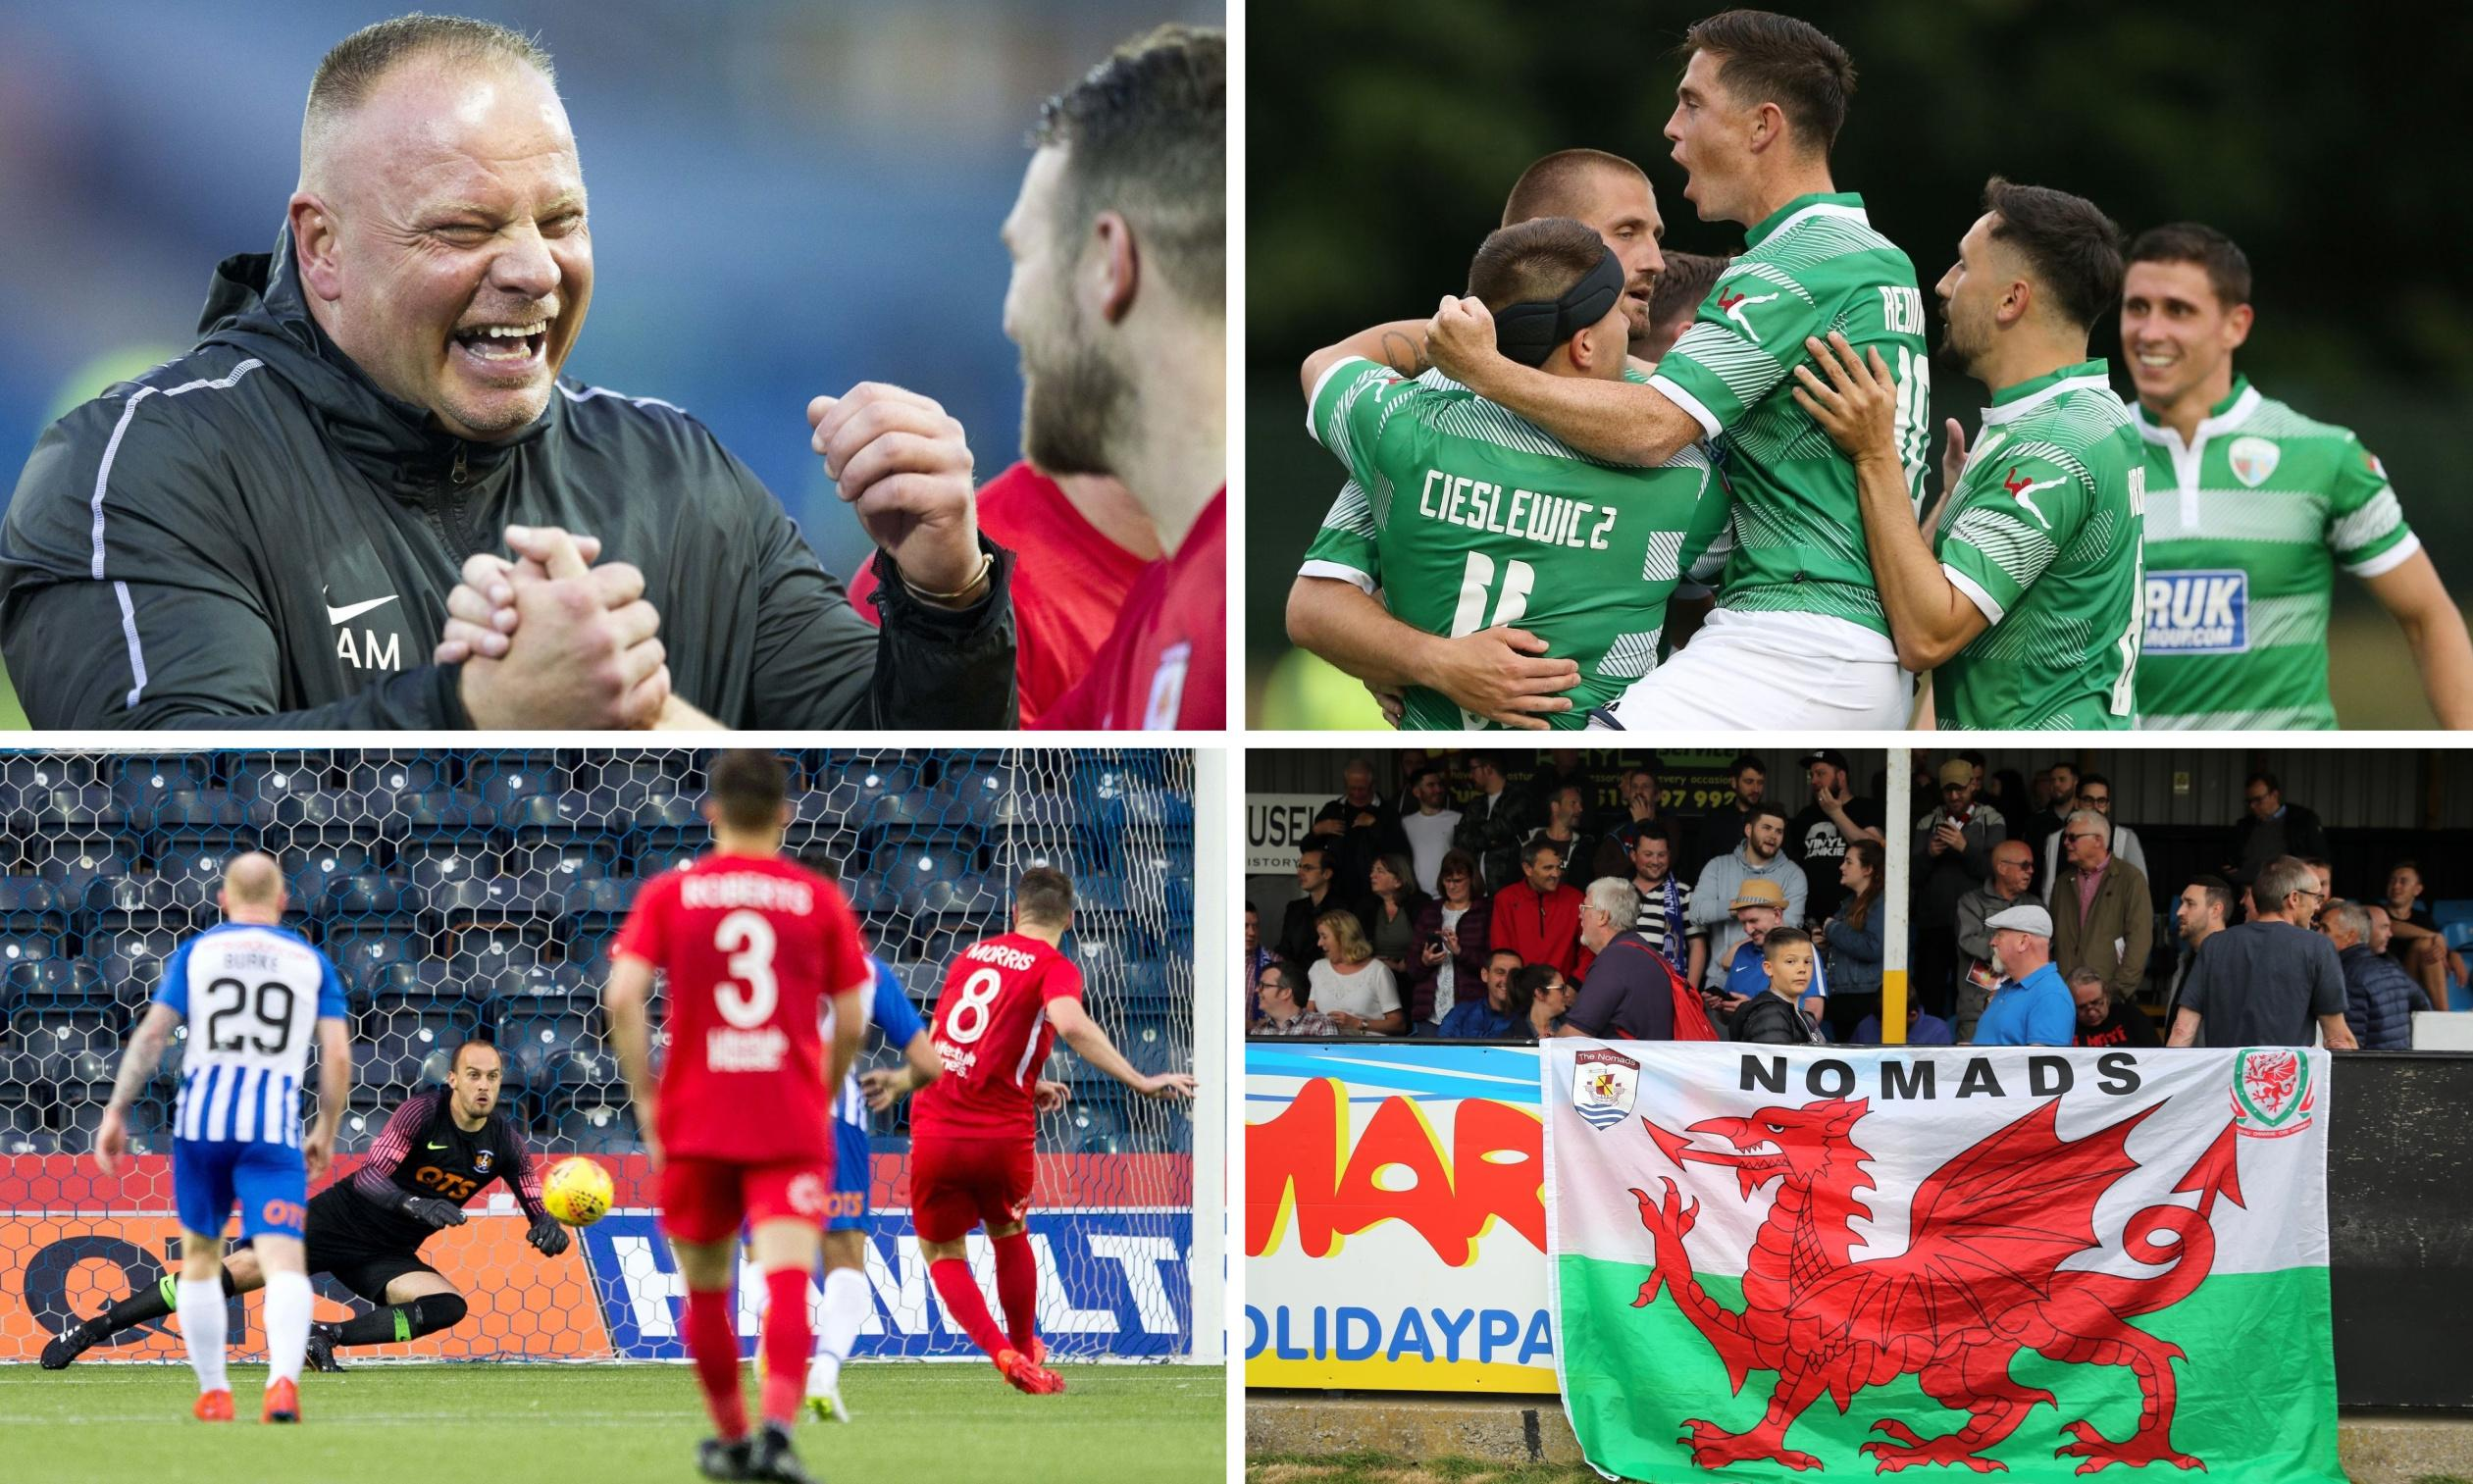 Welsh clubs breaking new ground after stirring European triumphs